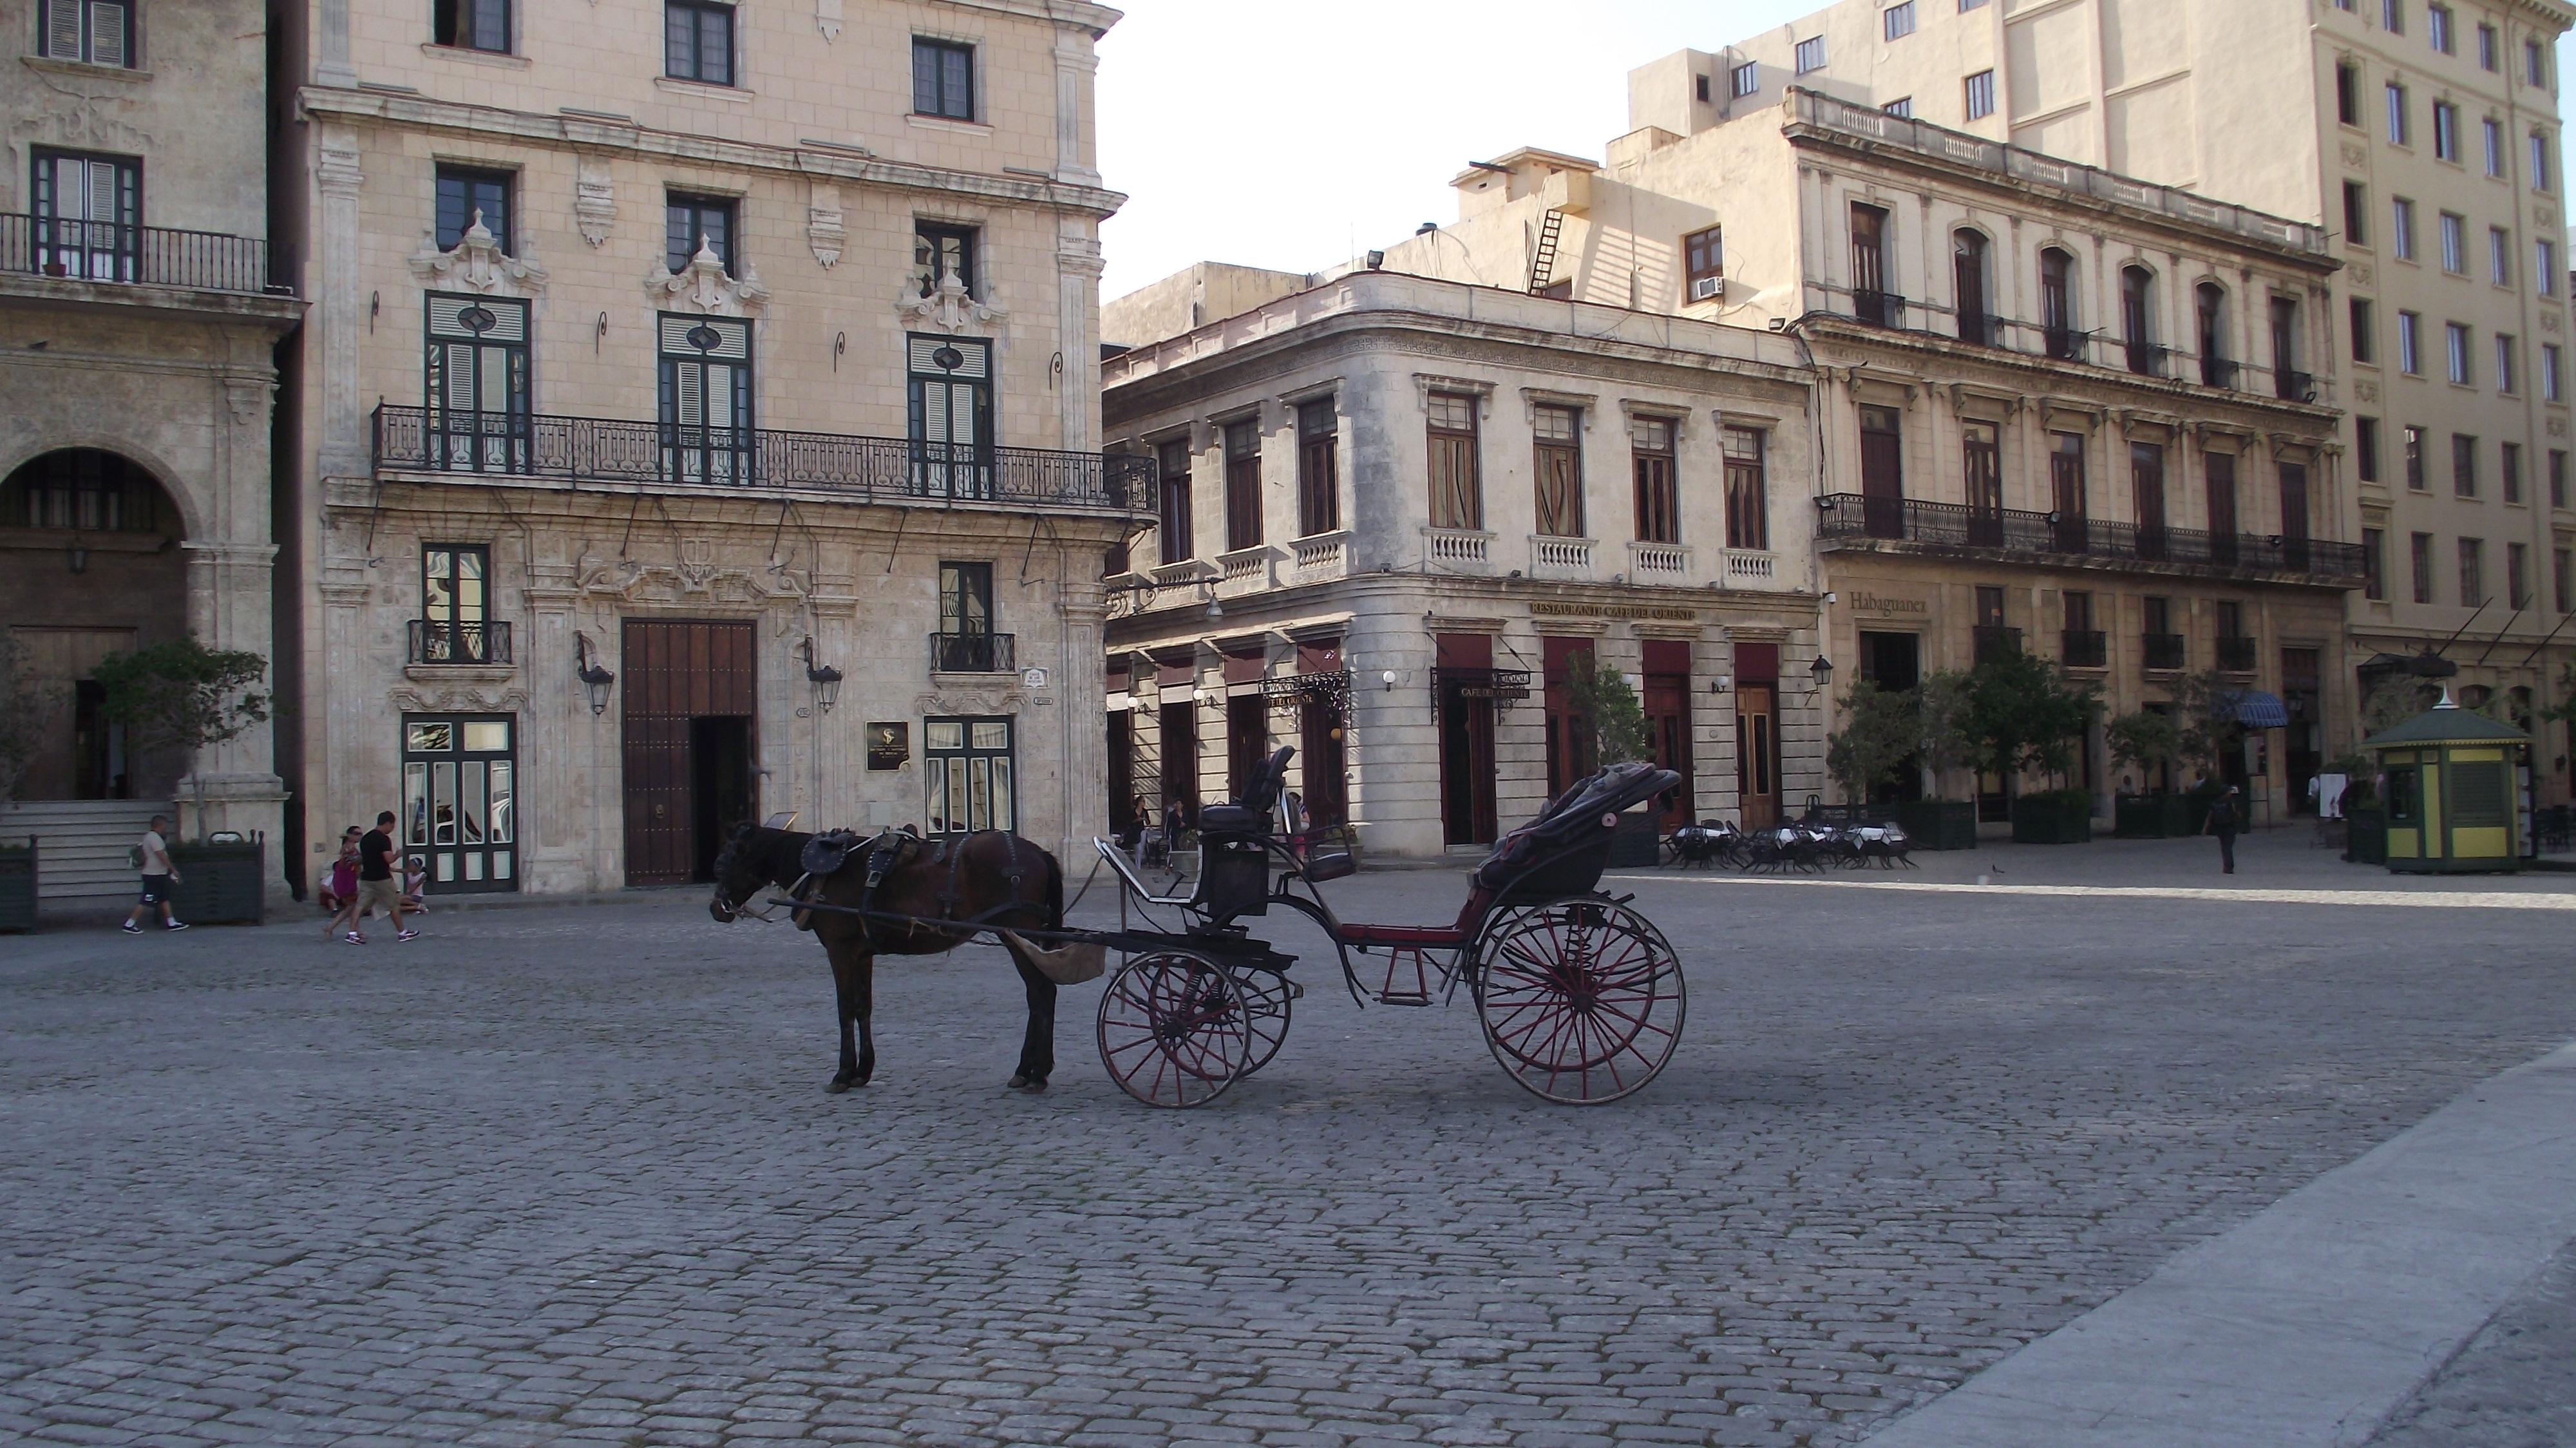 File:Plaza en la Habana Vieja.JPG - Wikimedia Commons